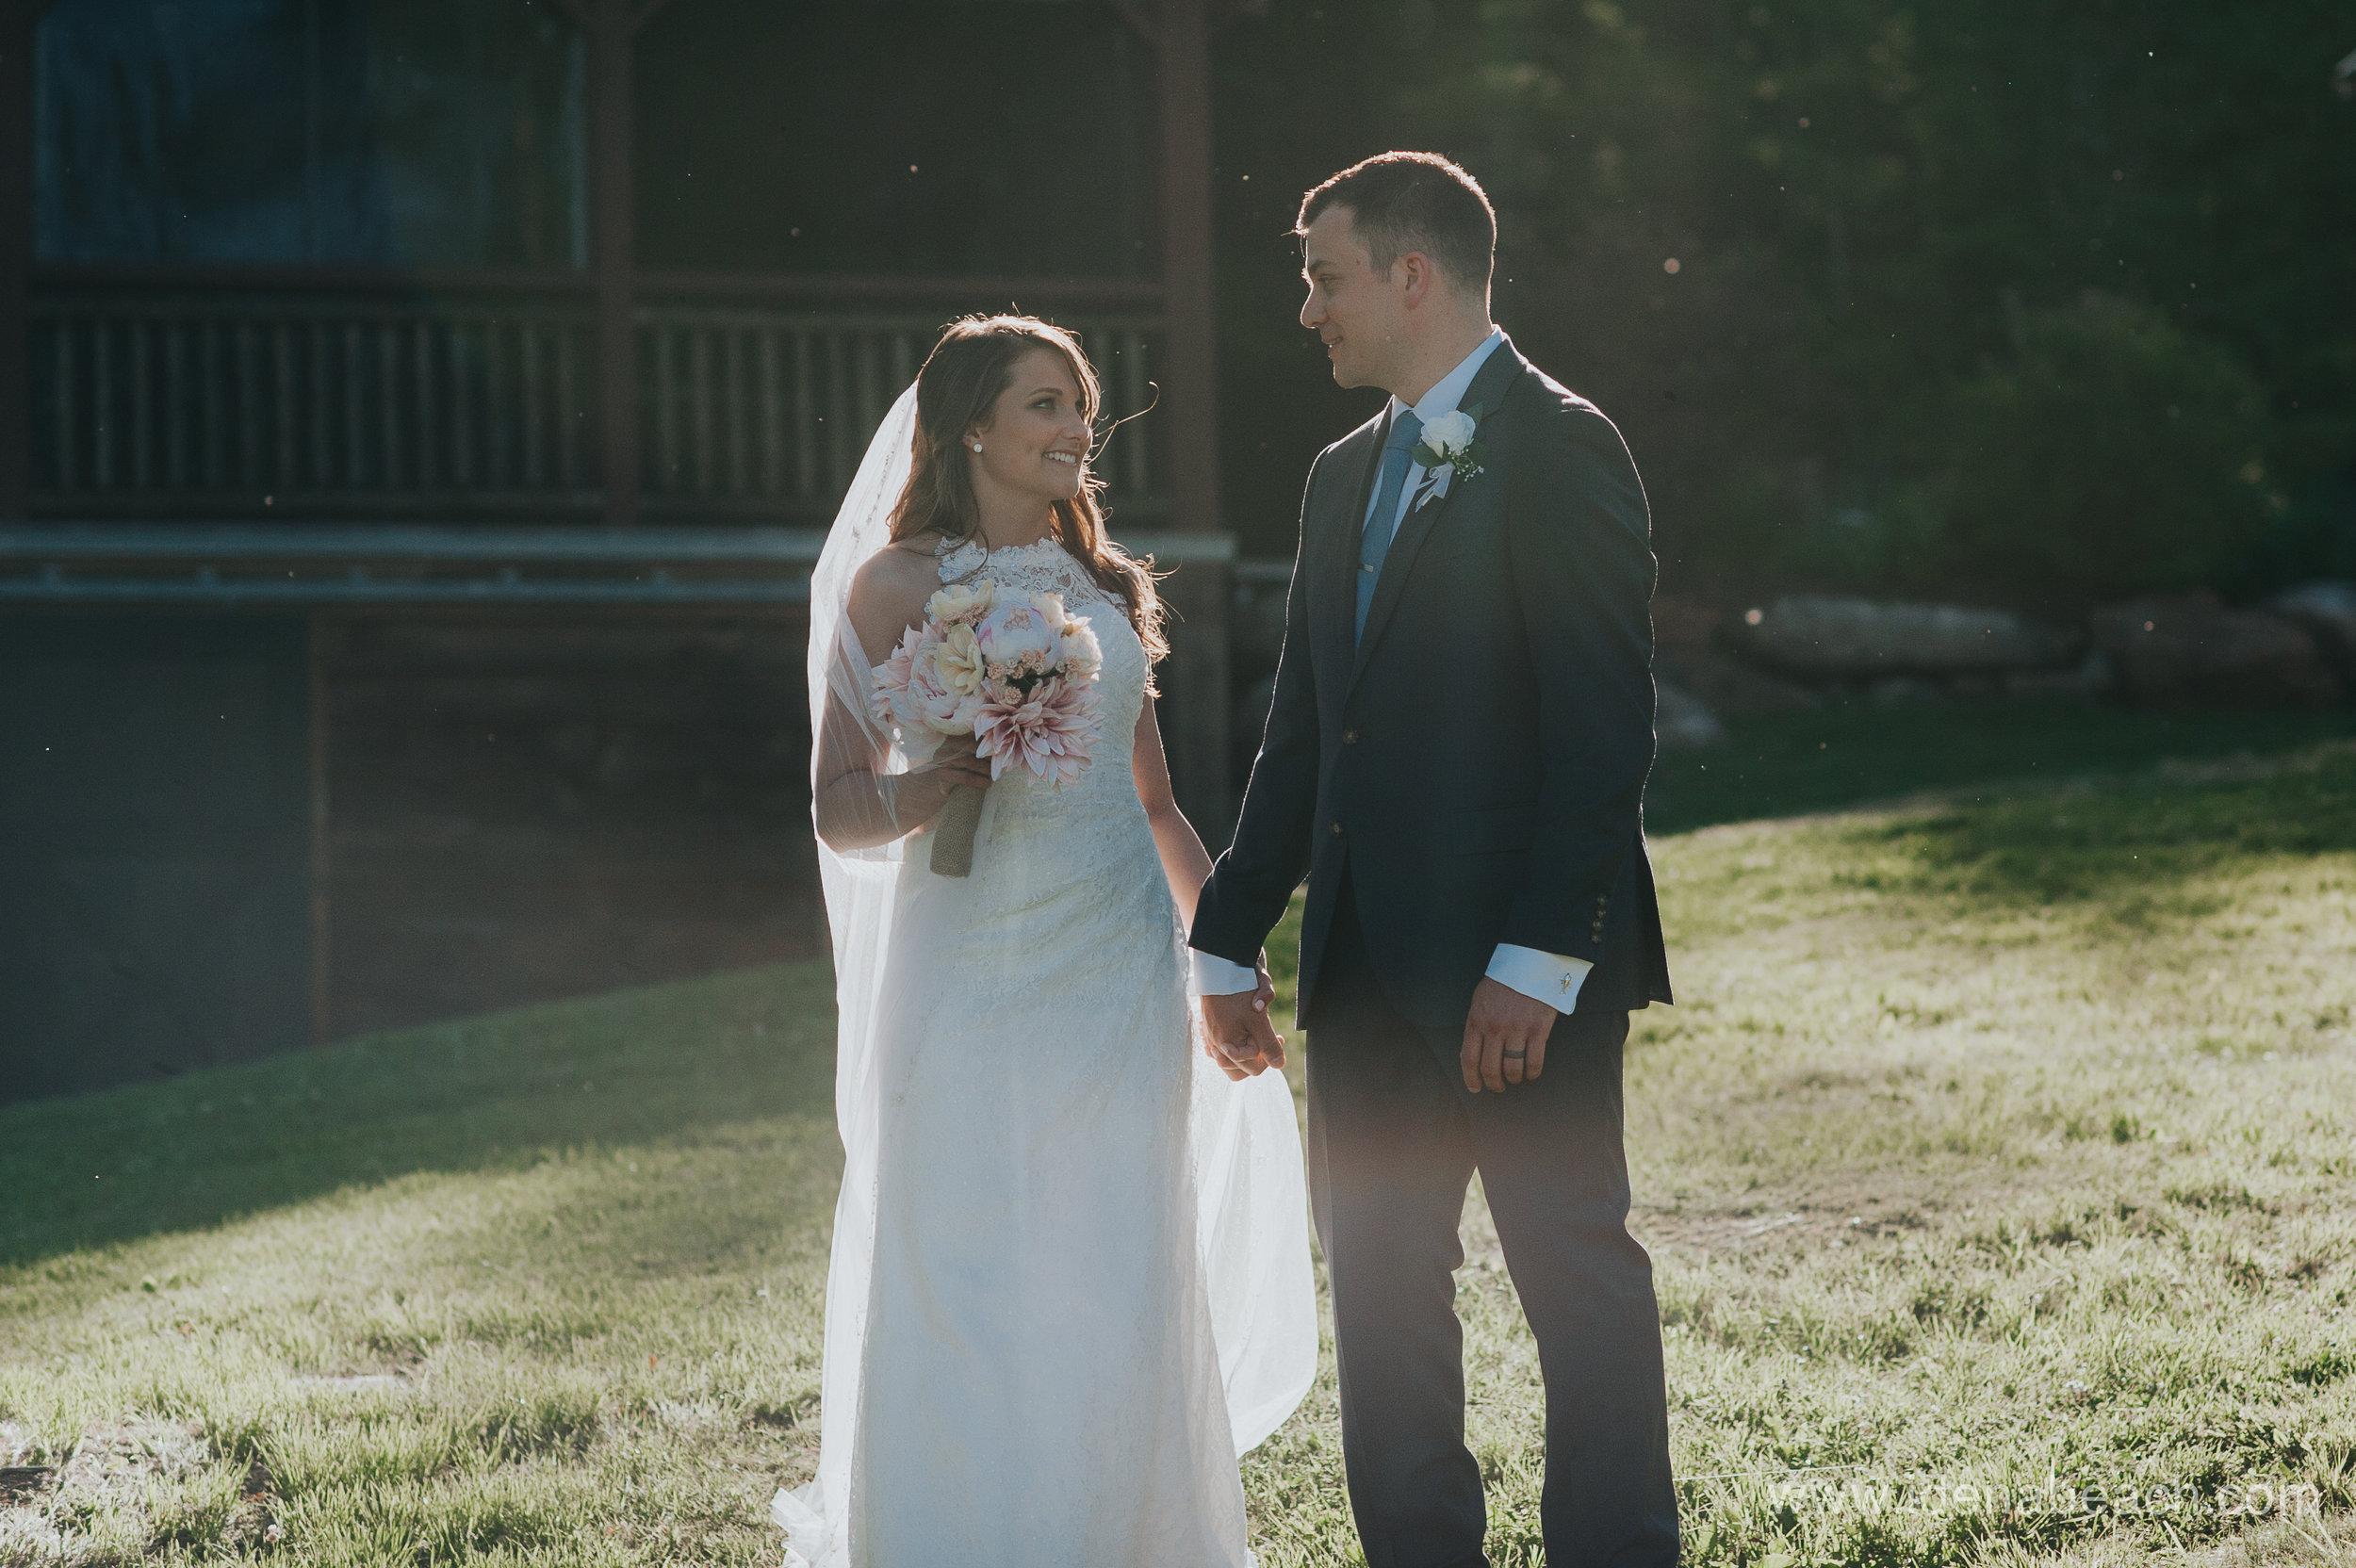 Mountain-Top-Inn-Vermont-Wedding-Photographer-106.jpg